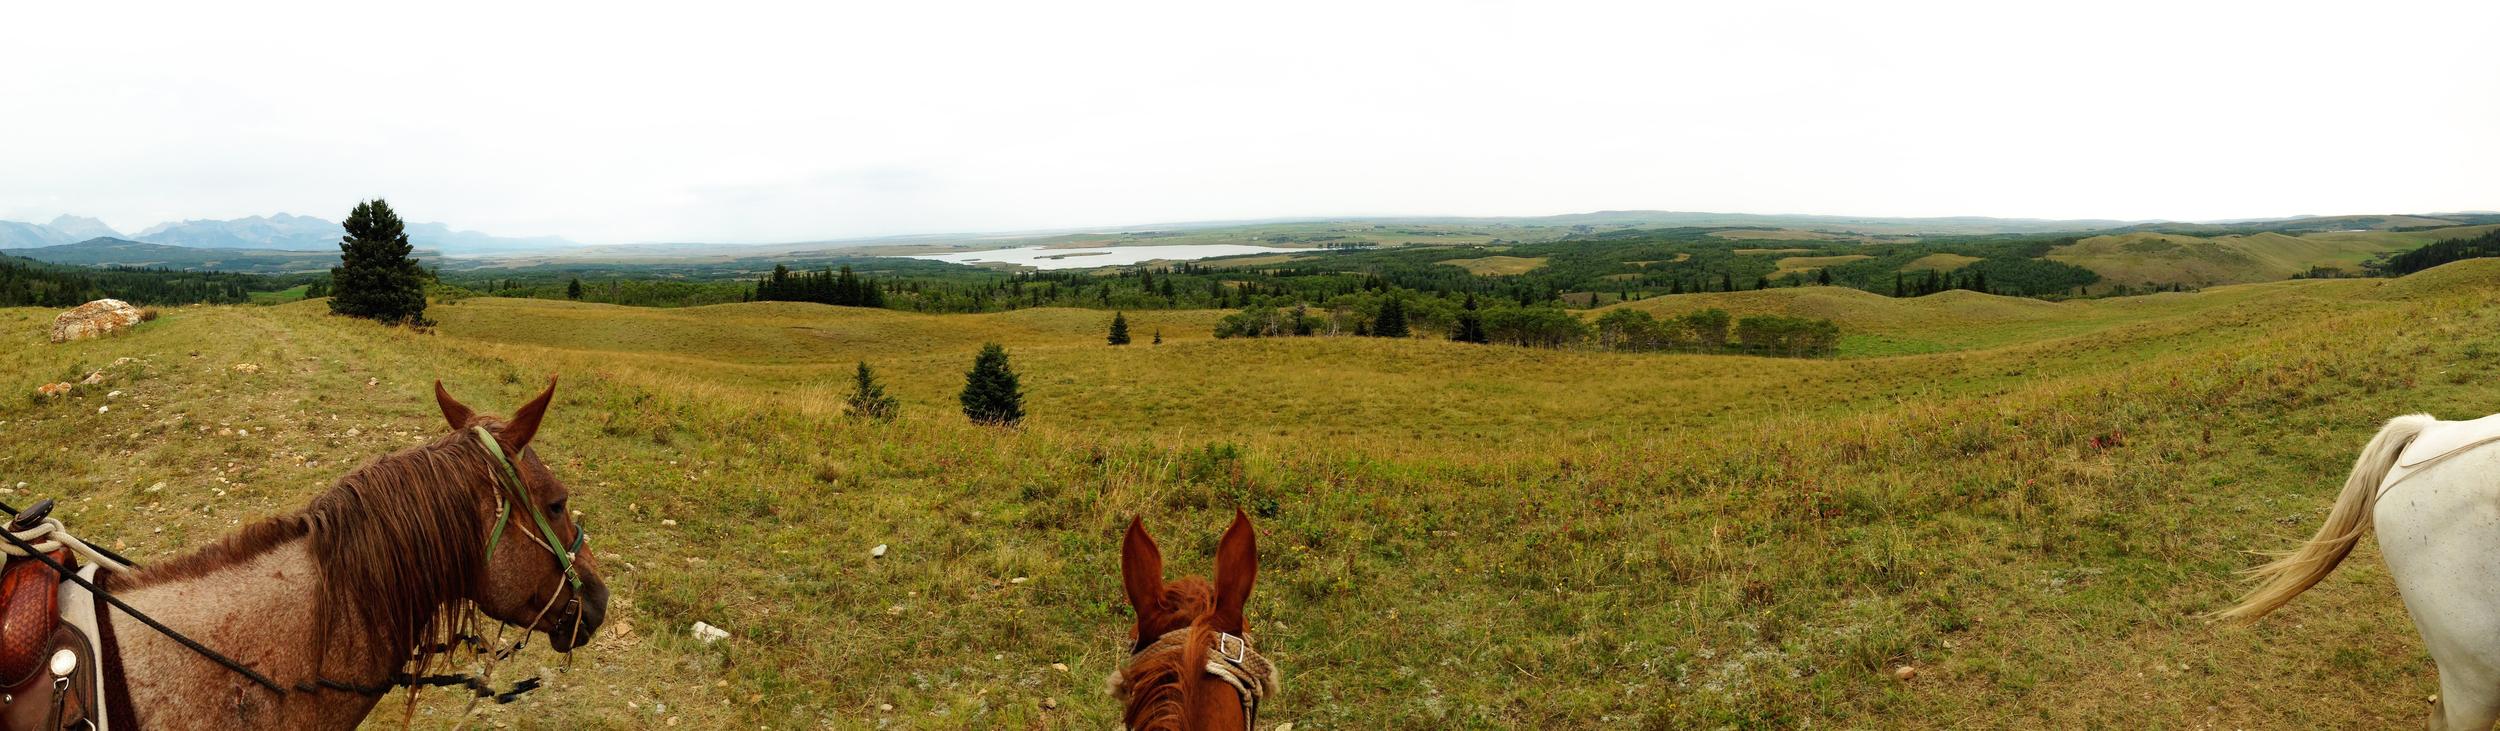 Deep Country  Waterton,Alberta, VHS / Miro Kerr-Hoy, August2012